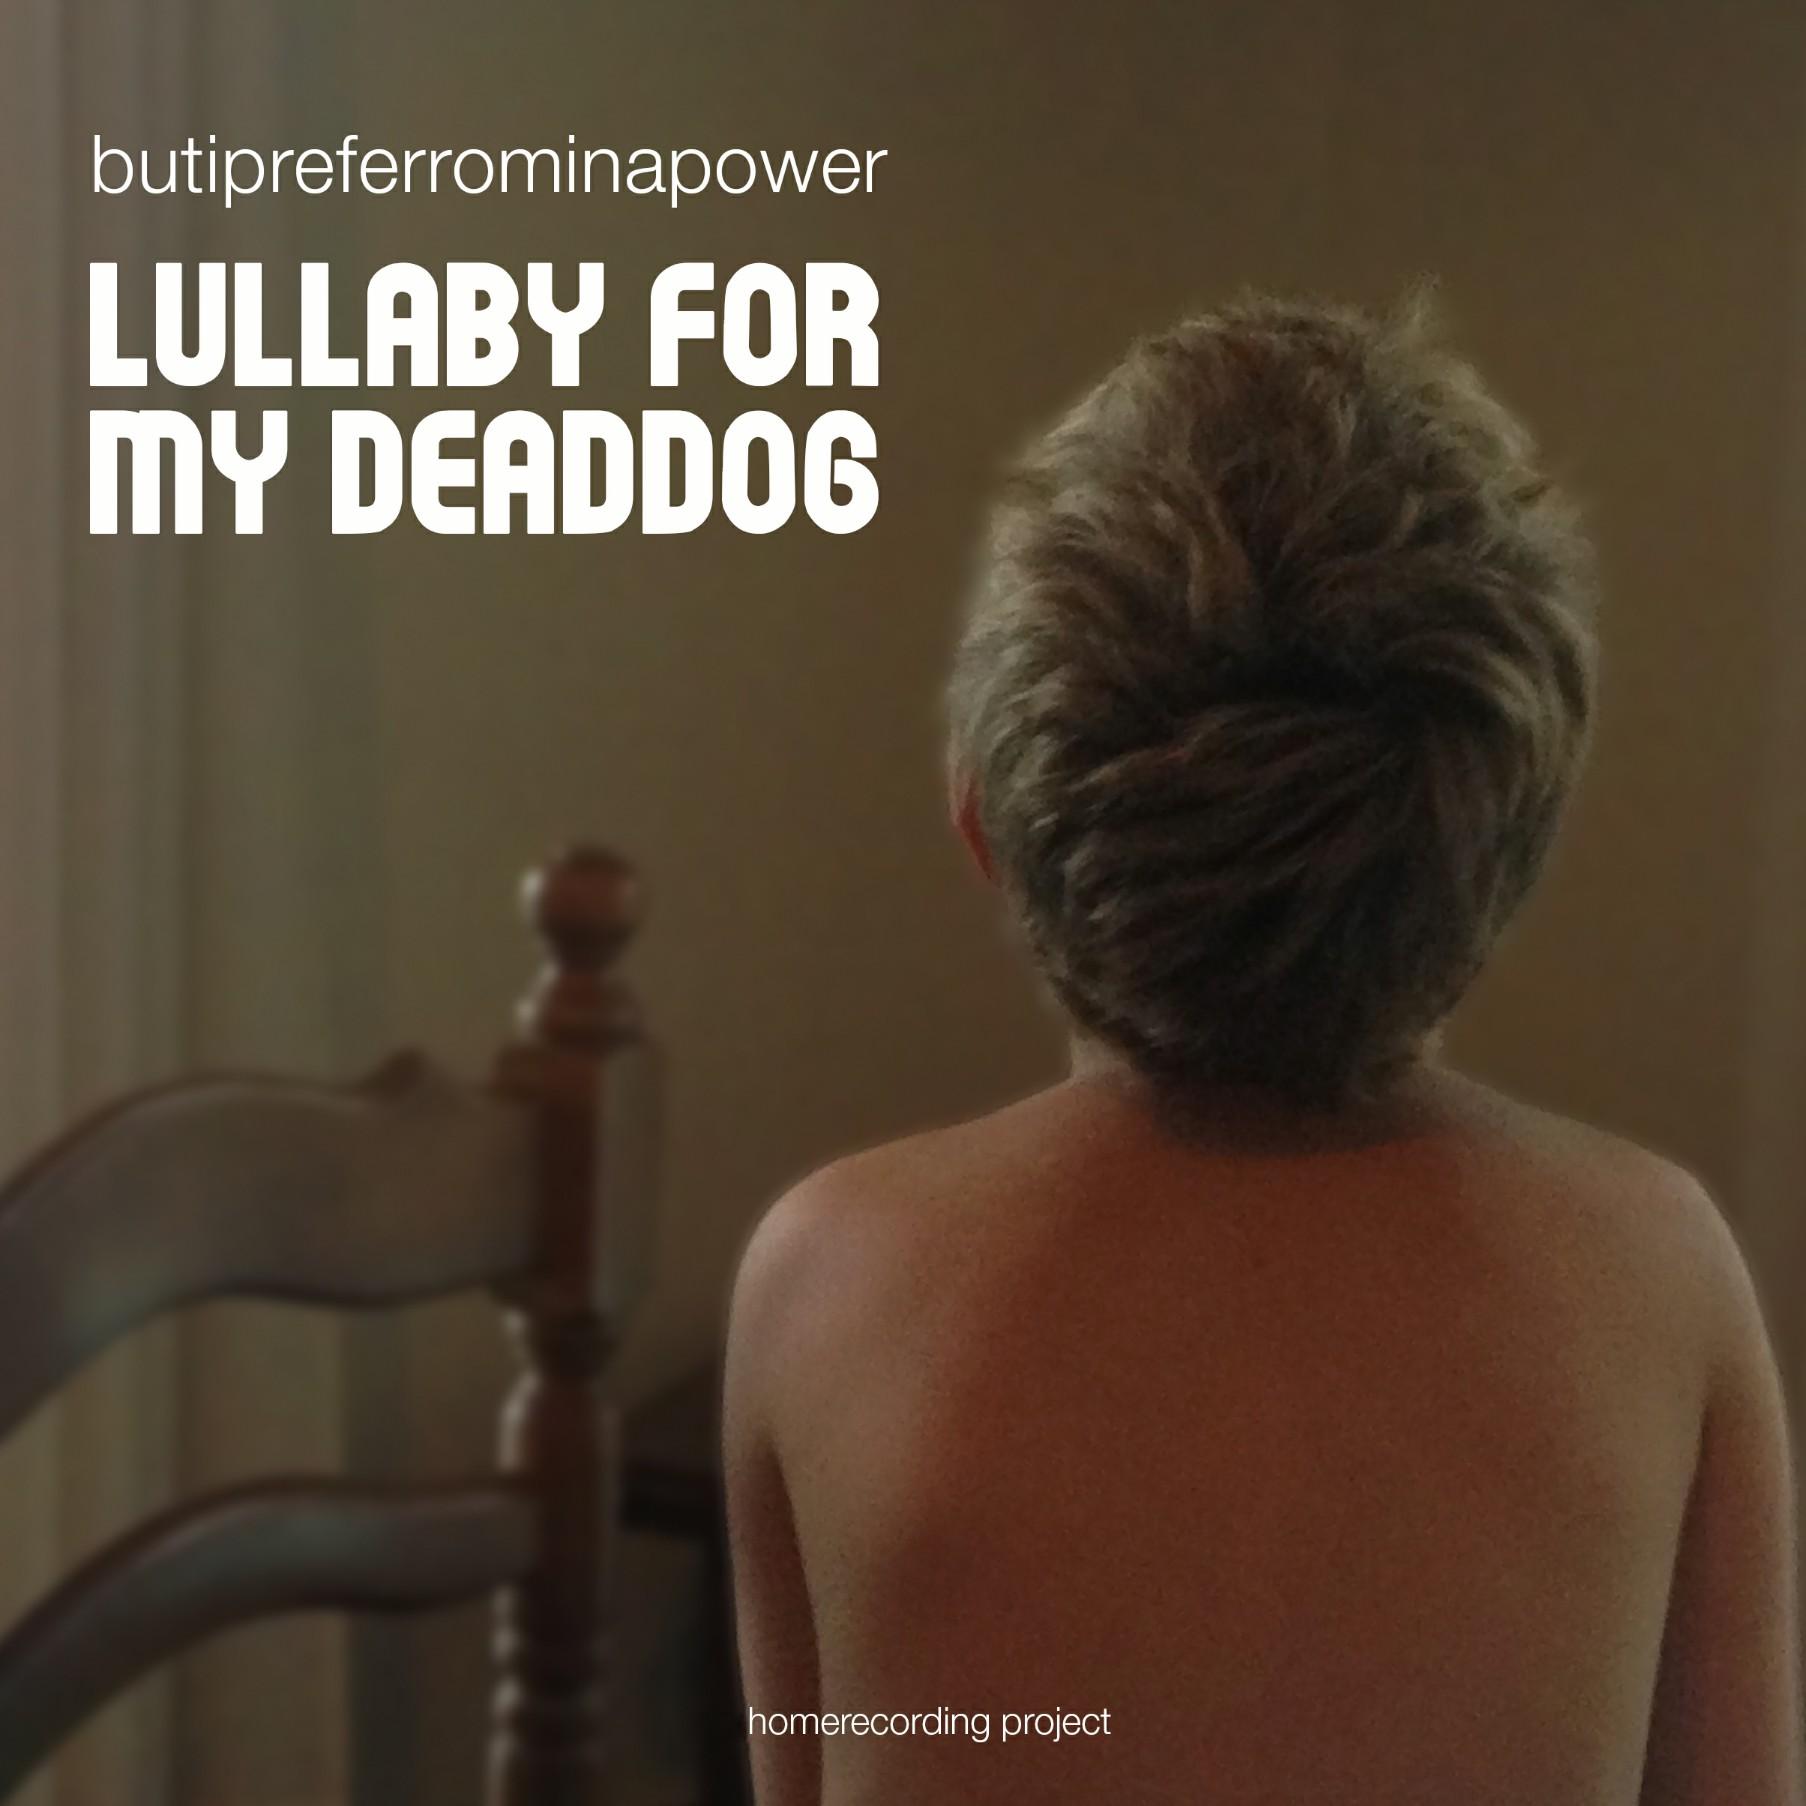 IYE19 - BUTIPREFERROMINAPOWER - LULLABY FOR MY DEADDOG 2